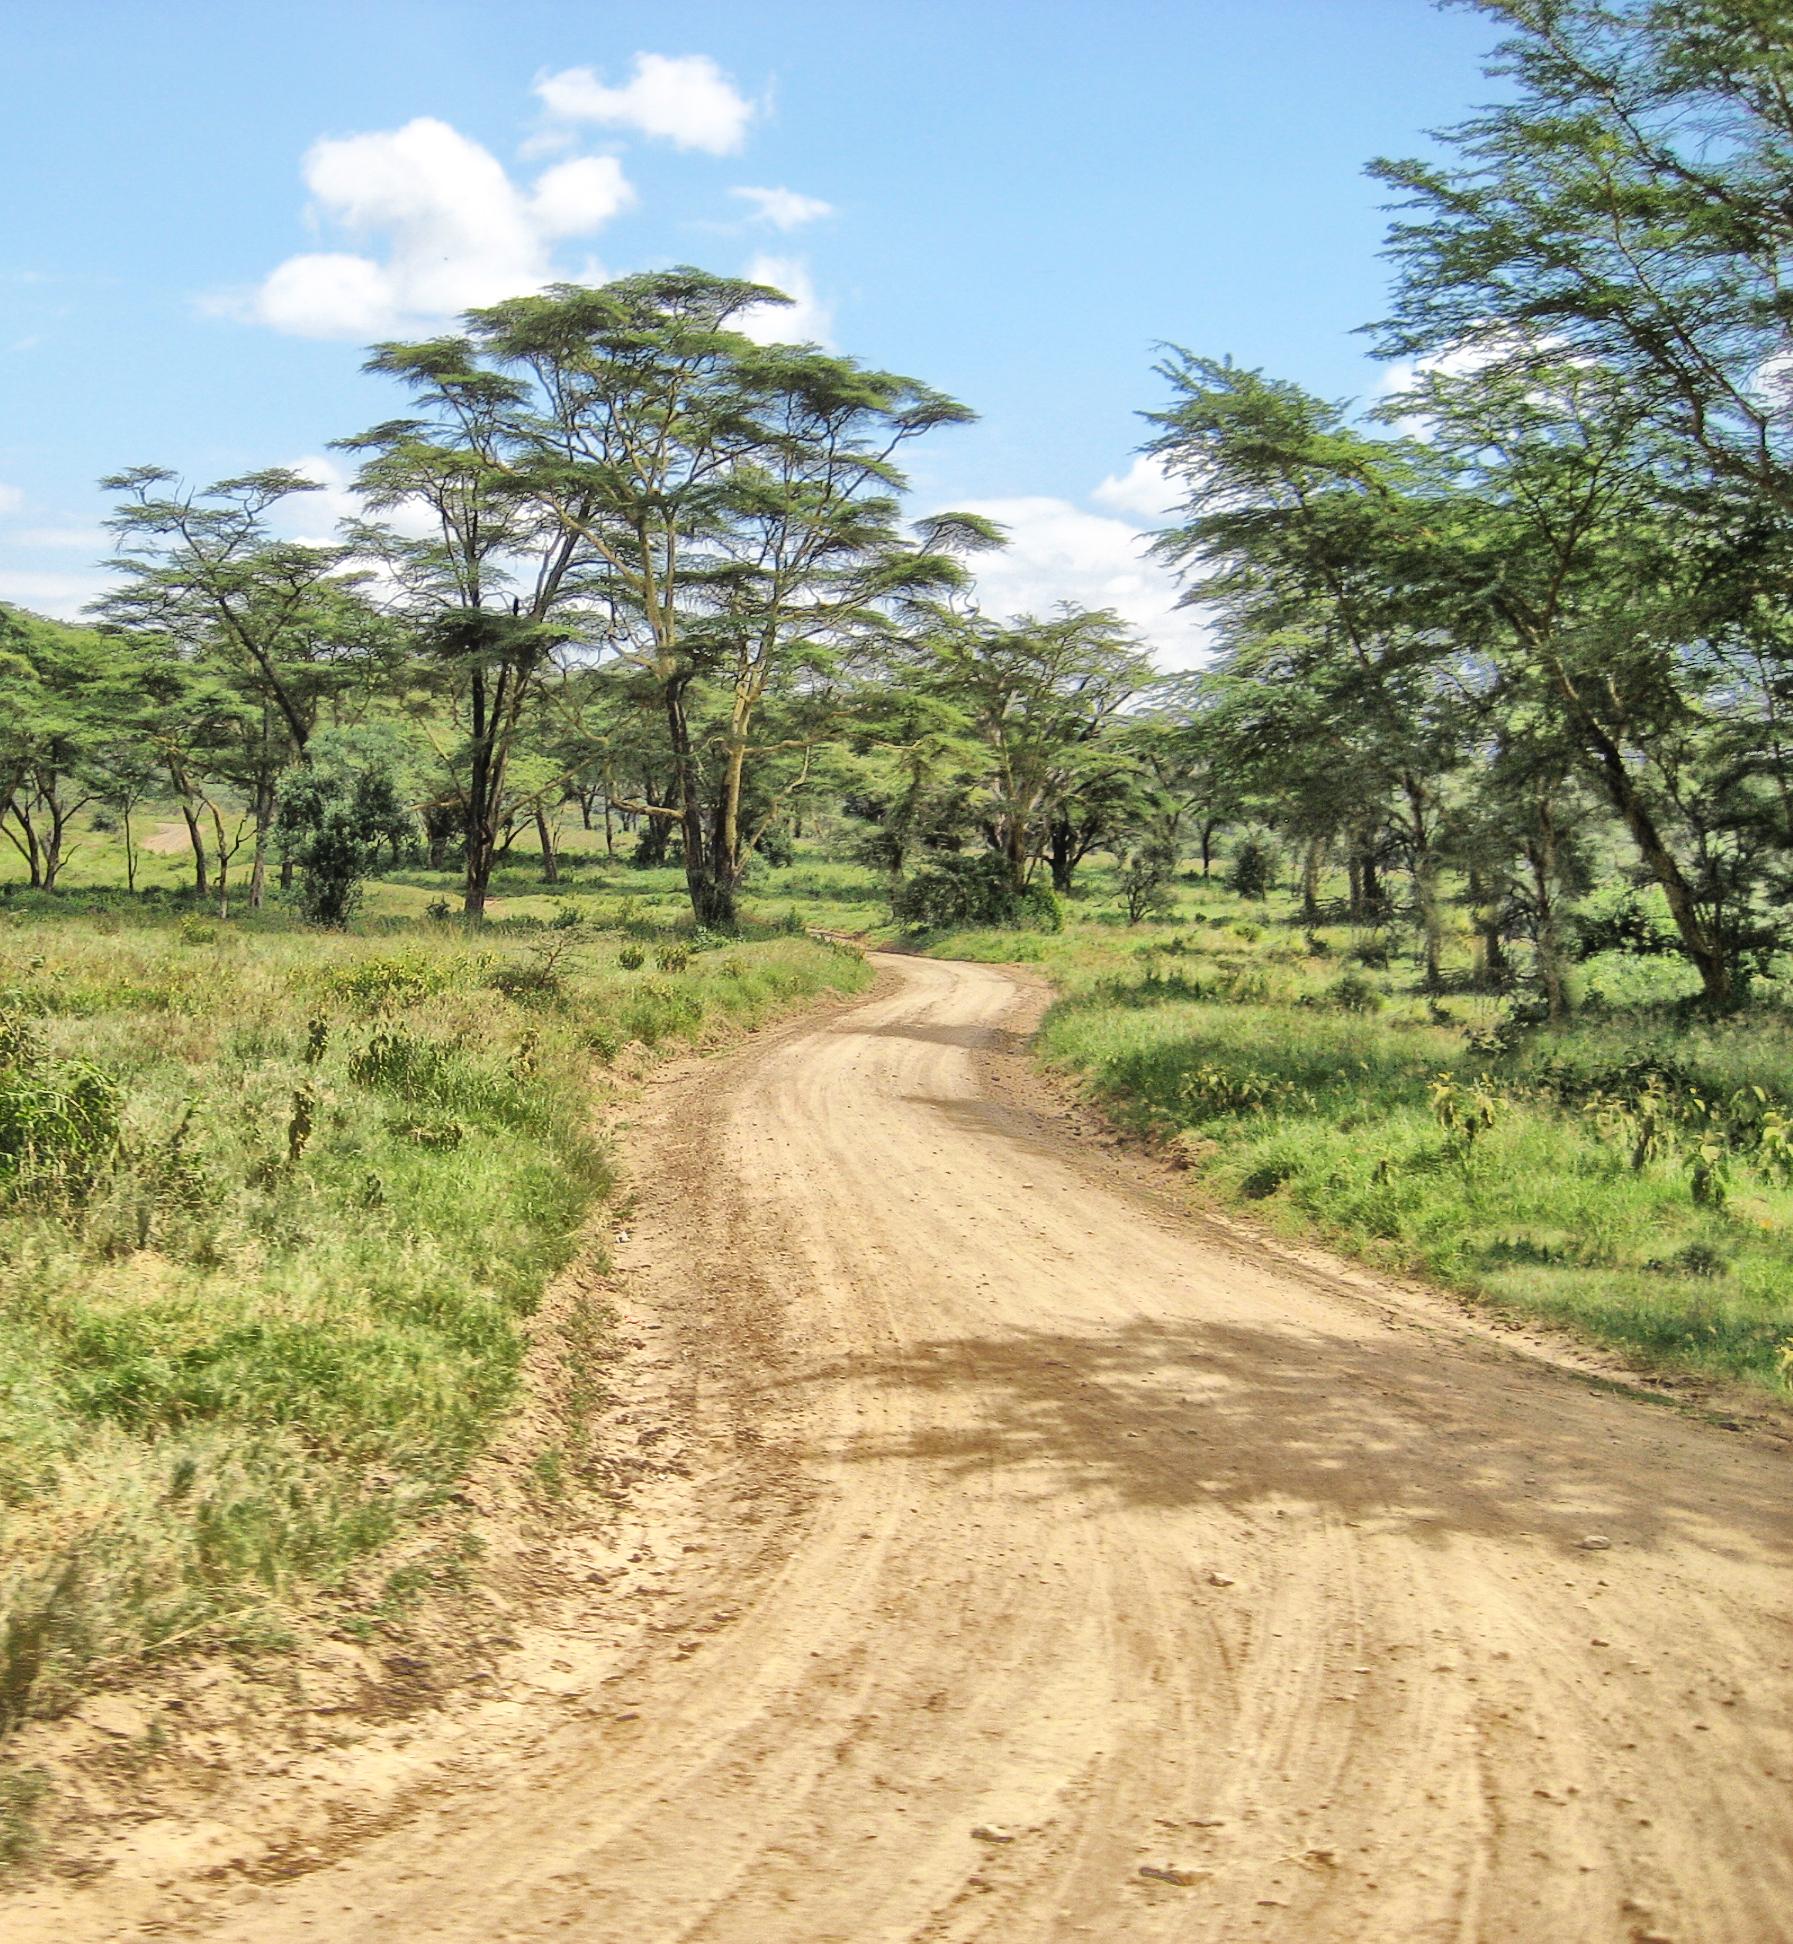 Kenya Tree 0193